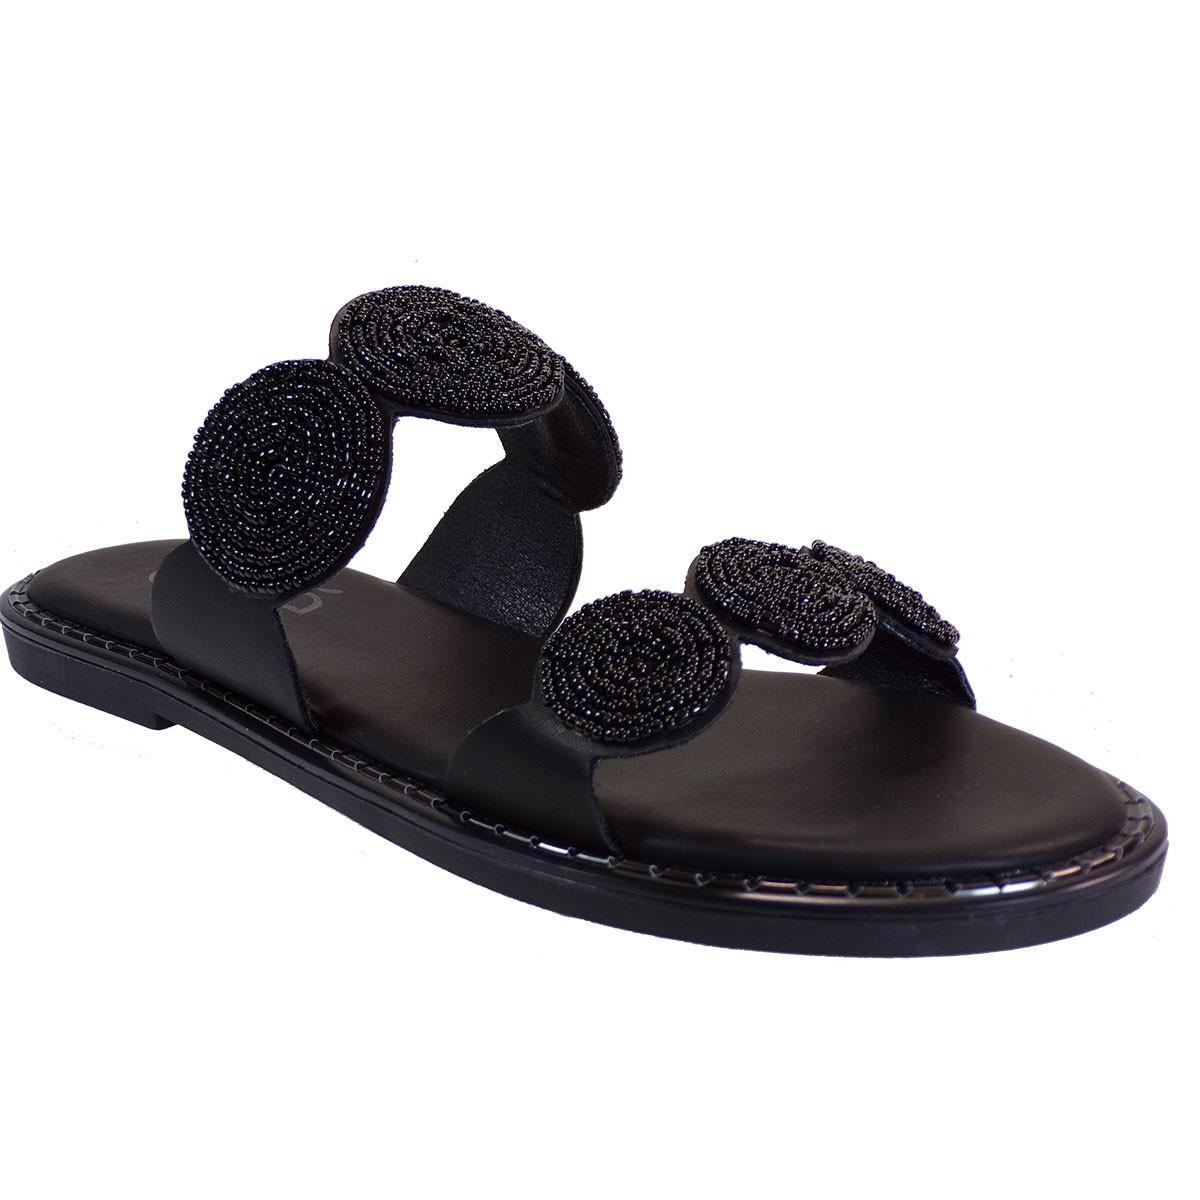 EXE Shoes Γυναικεία Παντόφλας ALLISON-112 Μαύρο M47001121001